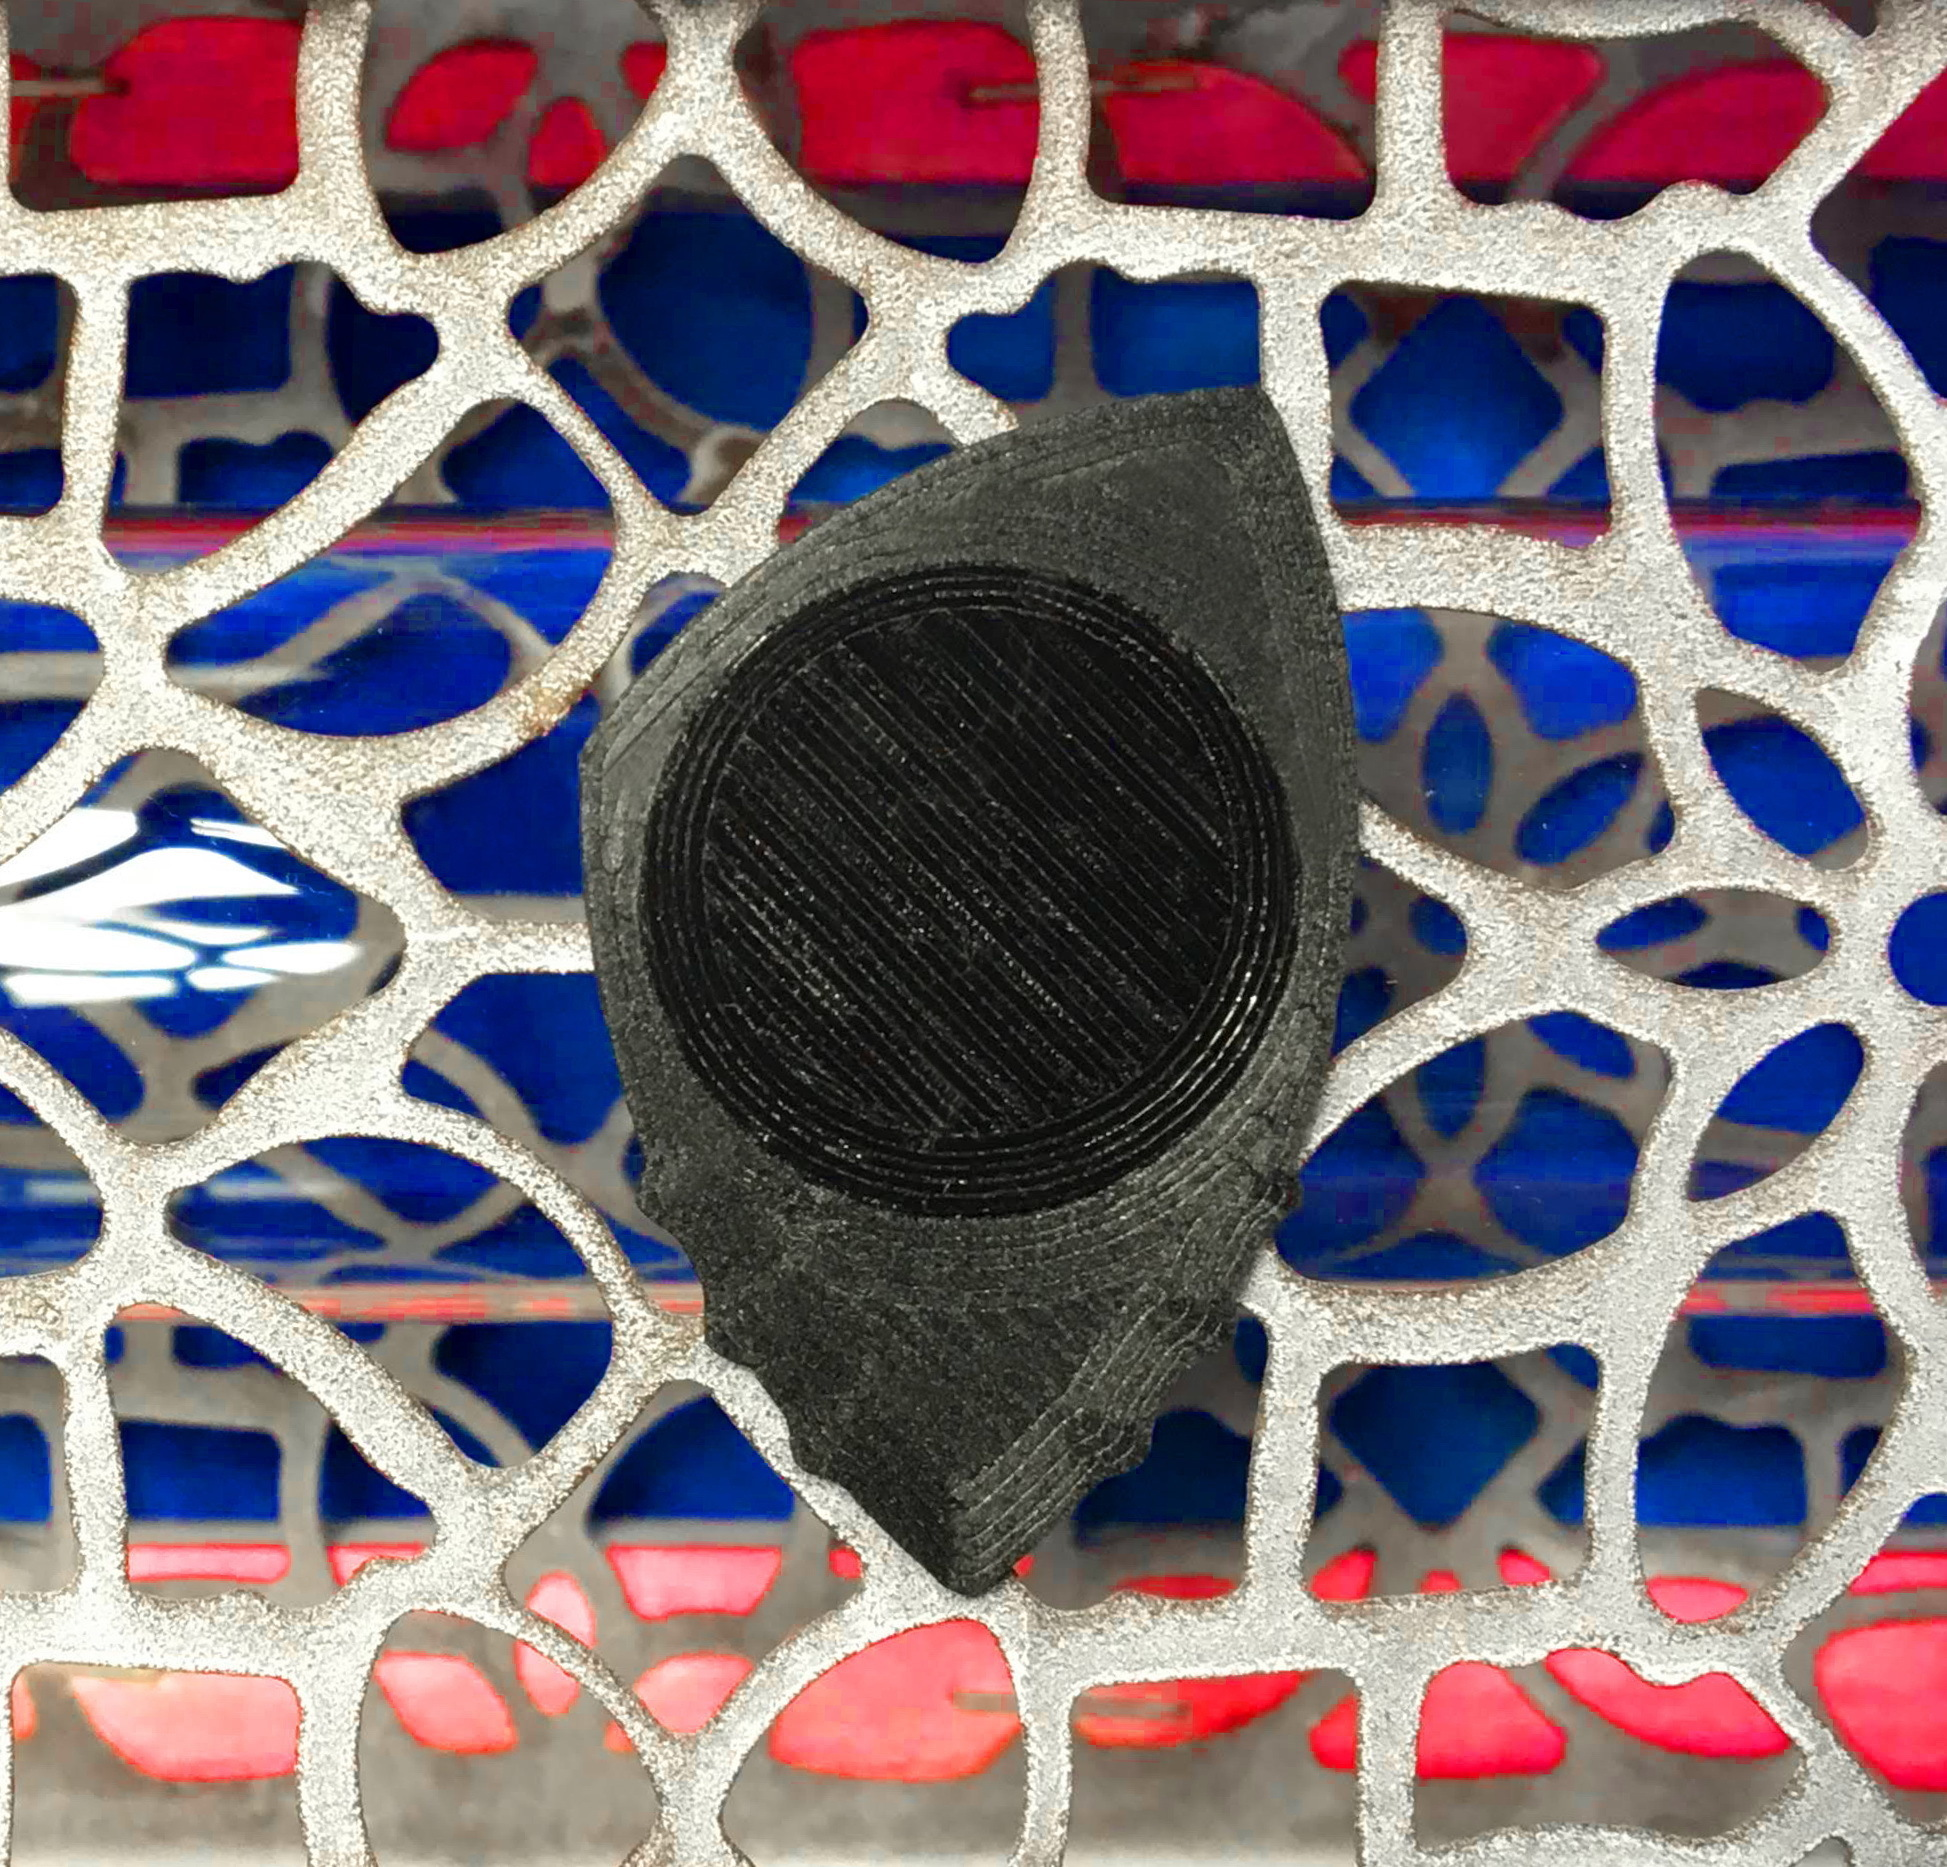 PitaDentFibra concentrico L245 R240grados.JPG Download free 3MF file Carbon Fiber PITA-DENT PLA Poly-Lactic Acid Guitar Spike with TPU Thermoplastic Polyurethane Non-Slip Grip Membrane • 3D printable model, carleslluisar